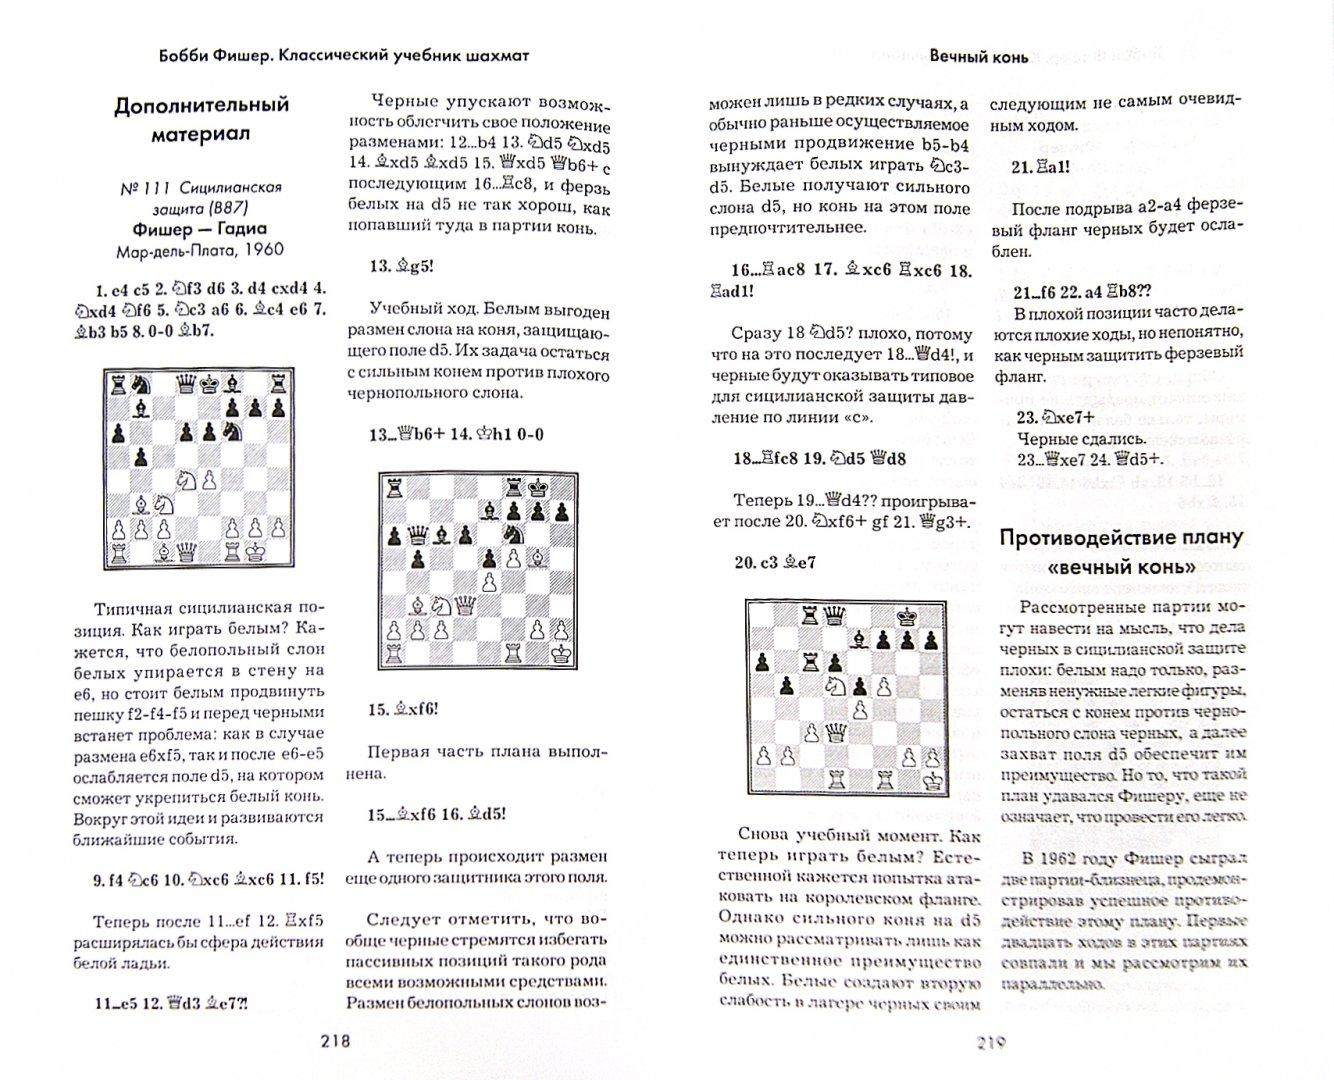 Иллюстрация 1 из 6 для Бобби Фишер. Классический учебник шахмат - Николай Калиниченко | Лабиринт - книги. Источник: Лабиринт